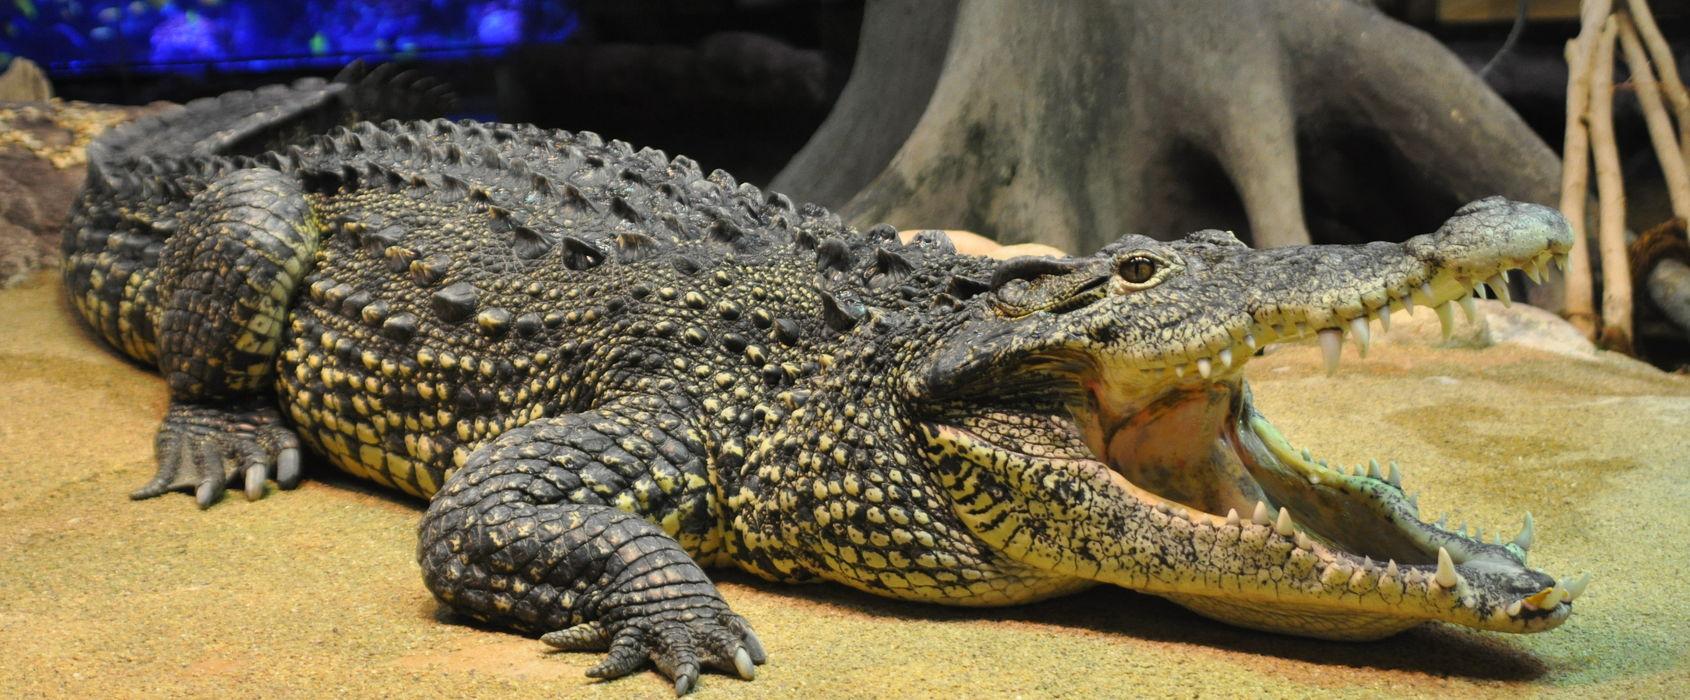 Krokodil på Skansen-Akvariet